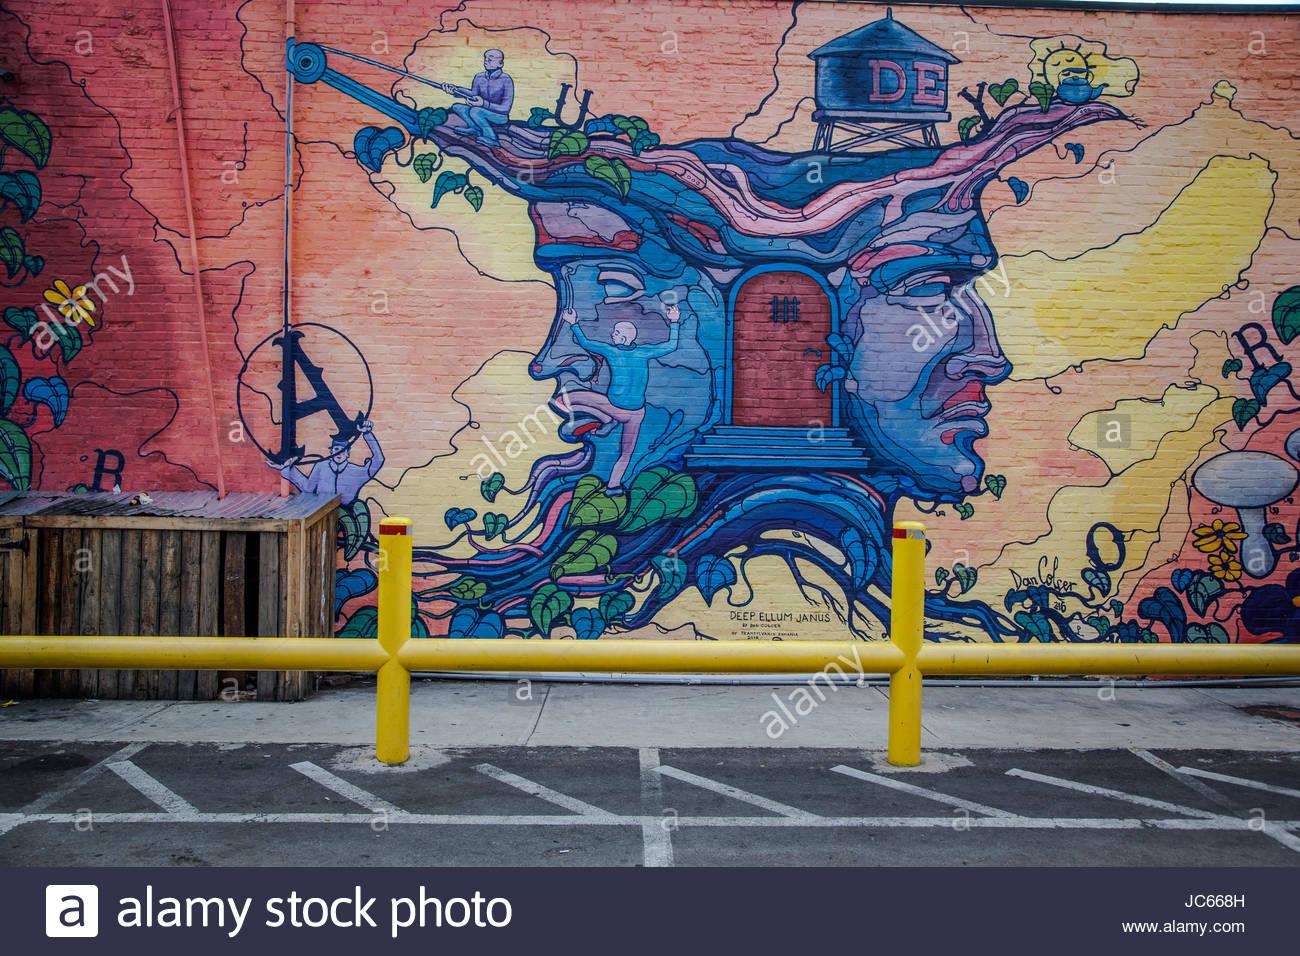 Graffiti wall dallas - Paintings On Wall Along A Sidewalk In Dallas Deep Ellum